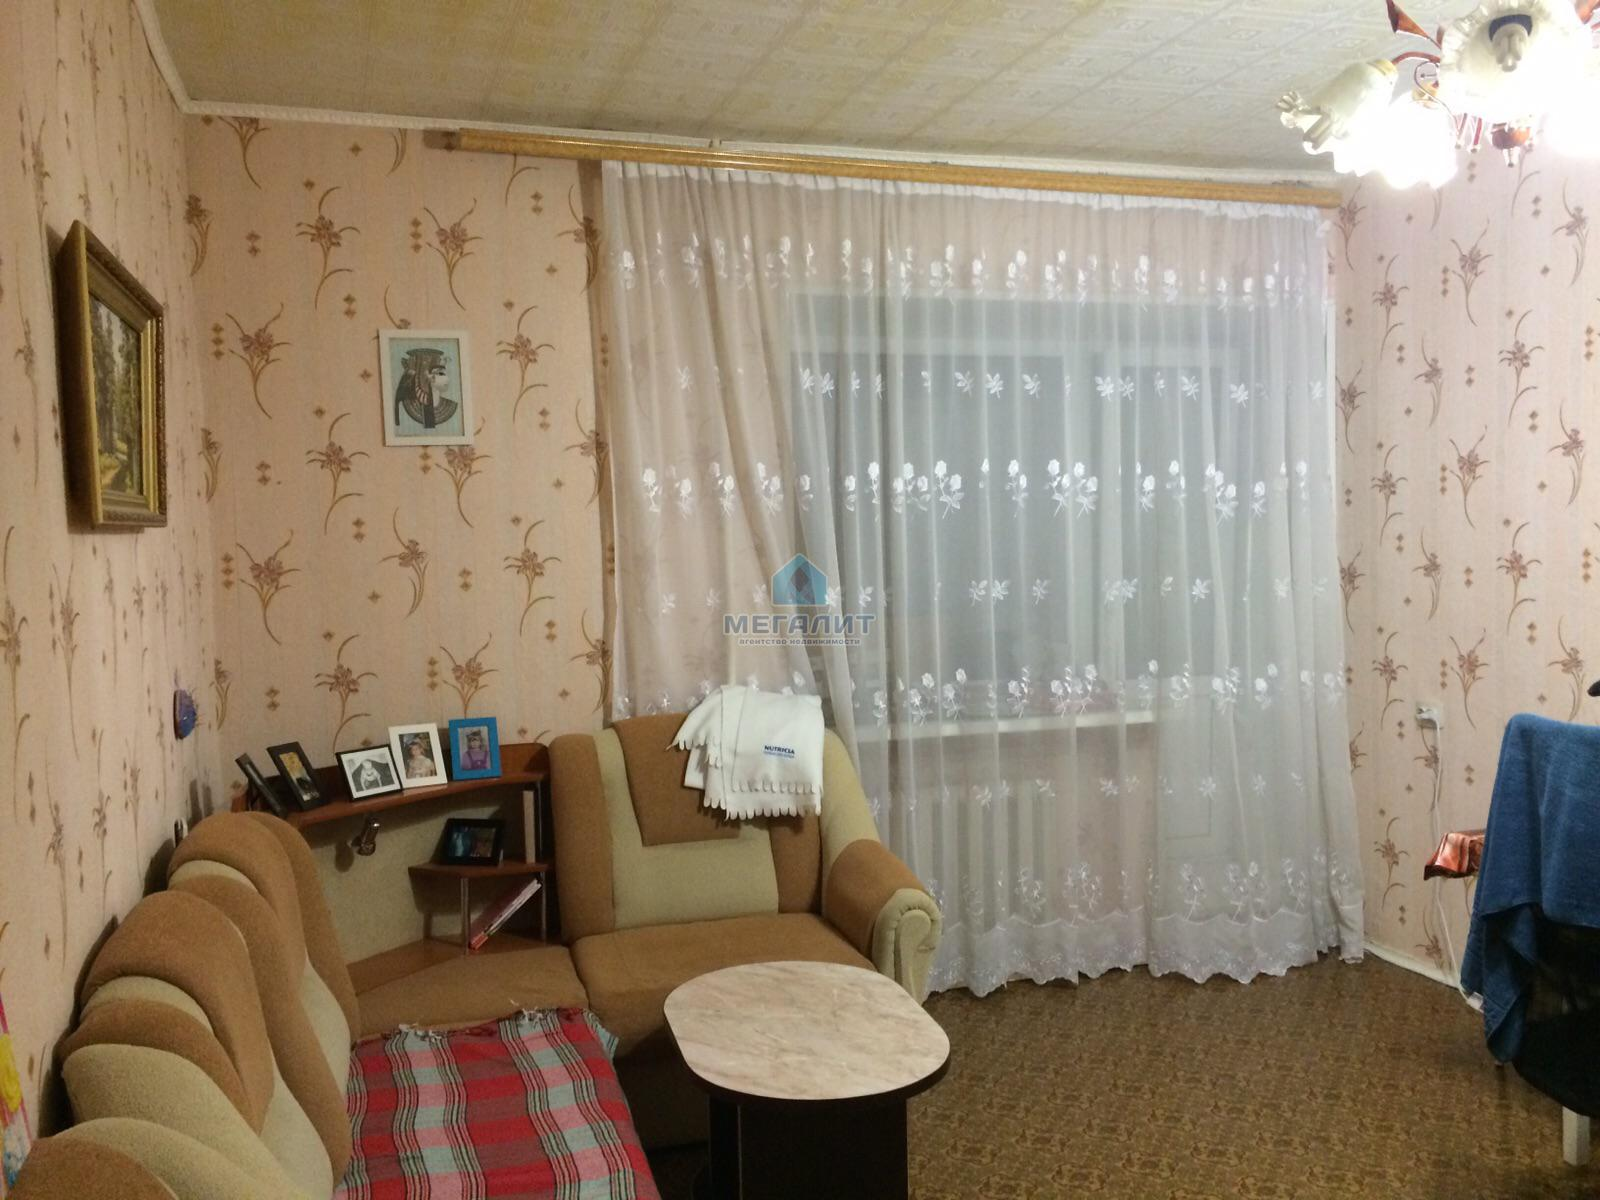 Аренда 1-к квартиры Хусаина Мавлютова 44, 43 м² (миниатюра №6)